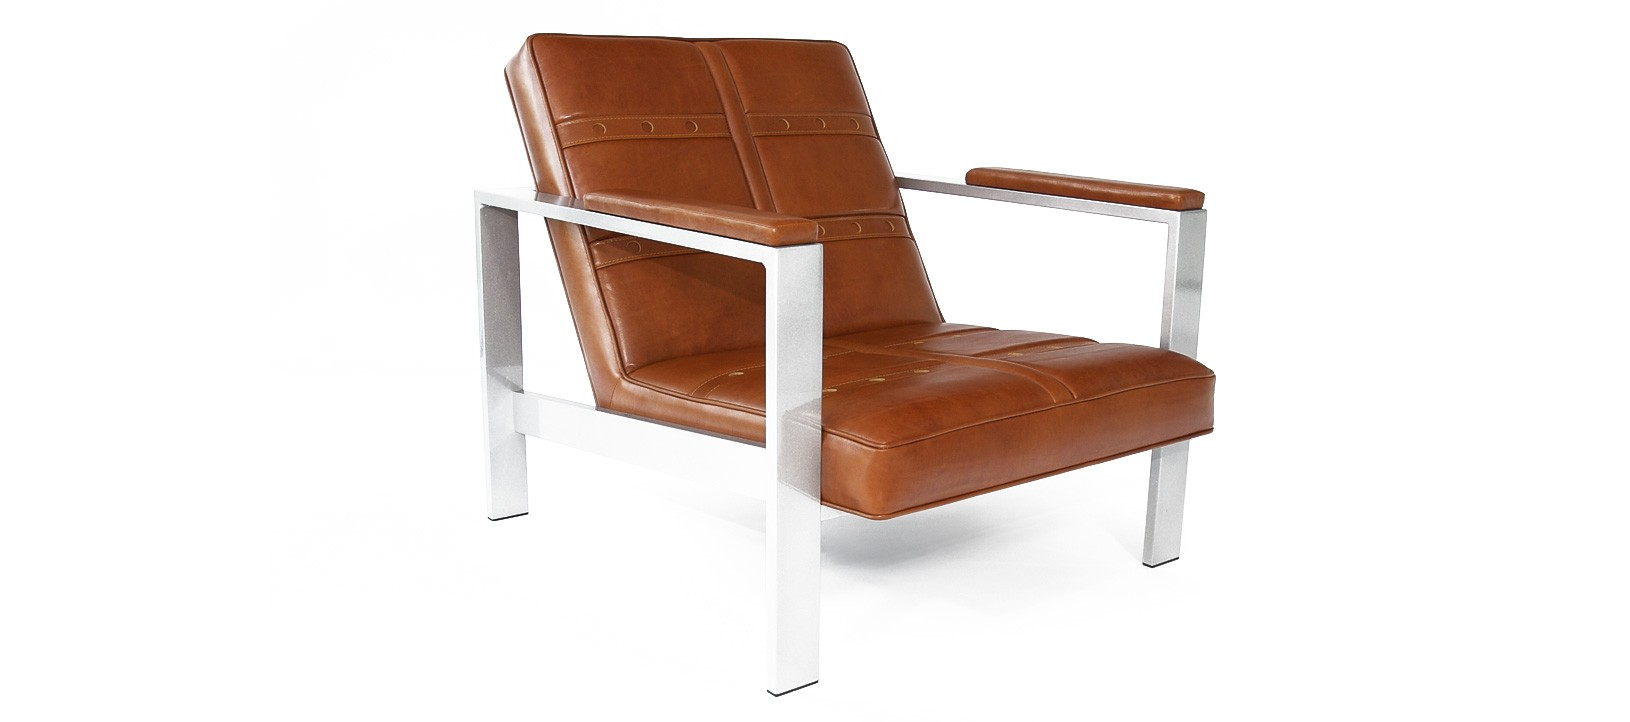 Daytona Lounge Chair by Philip Caggiano